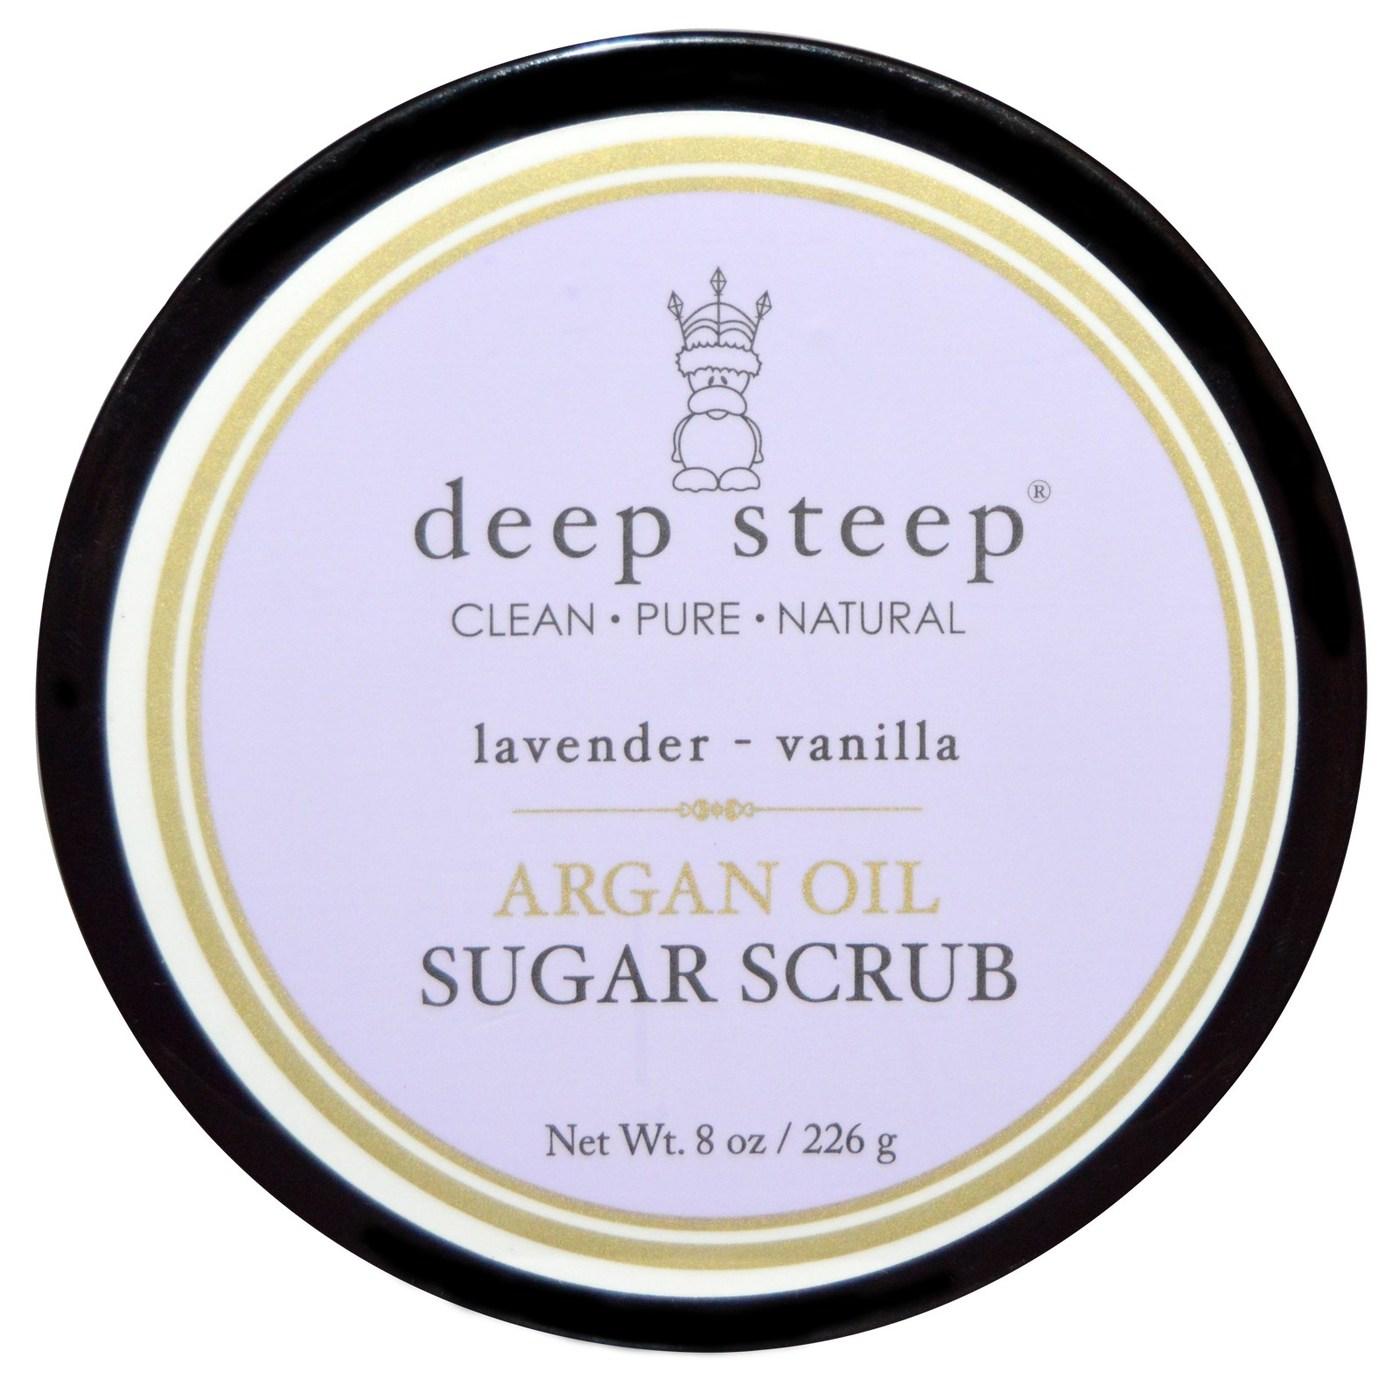 Buy Deep Steep Argan Oil Sugar Scrub, Lavender Vanilla - 8 oz UK